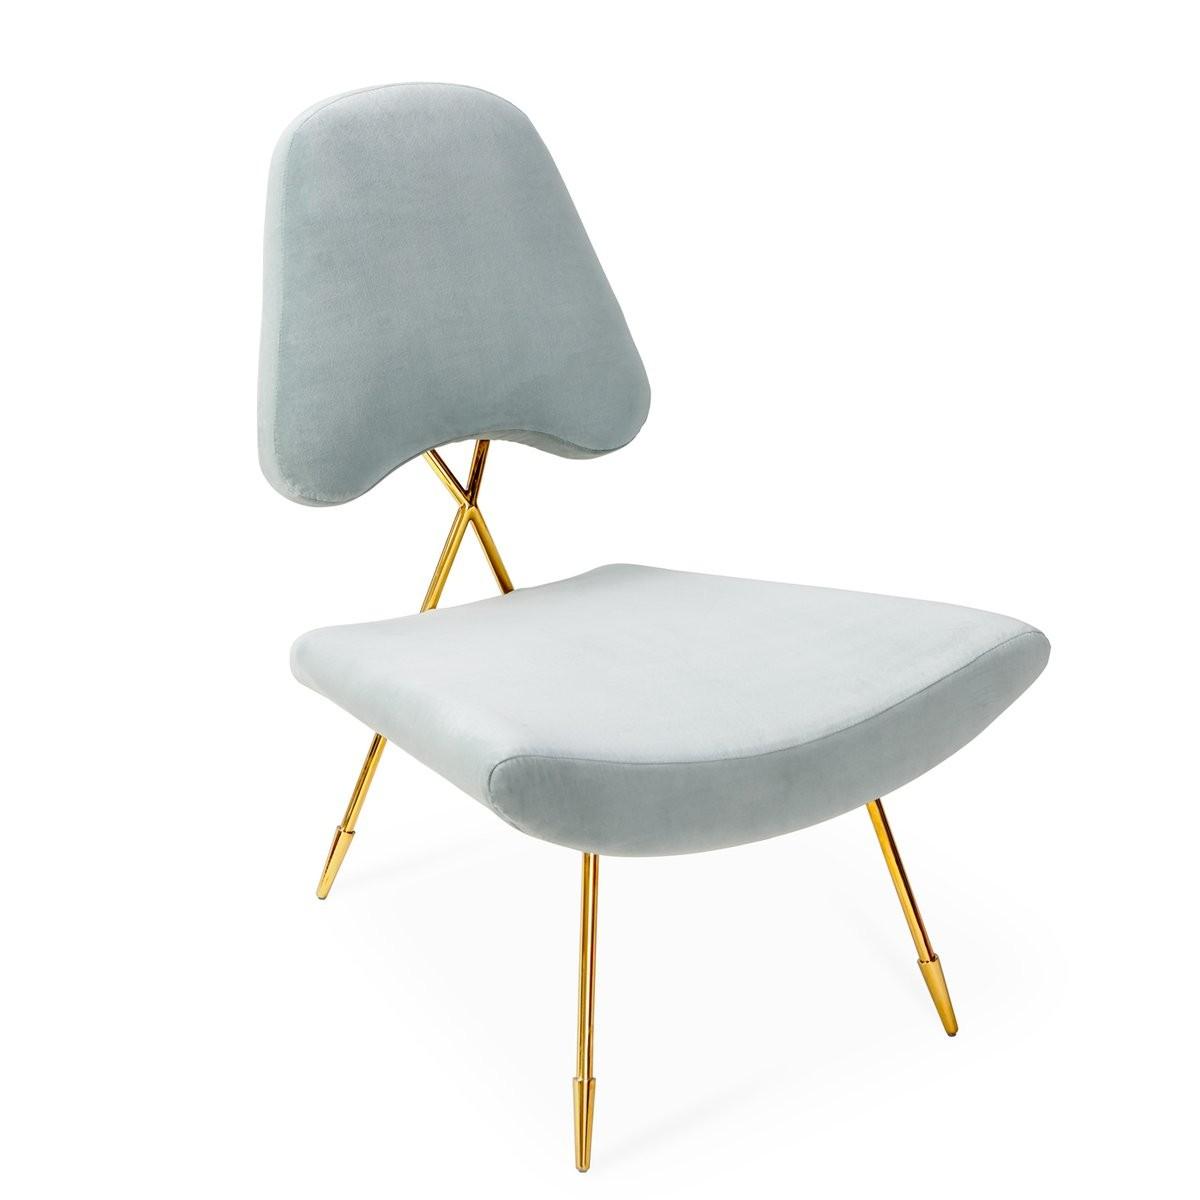 Jonathan Adler I Maxime Lounge Chair I Lido Celedon